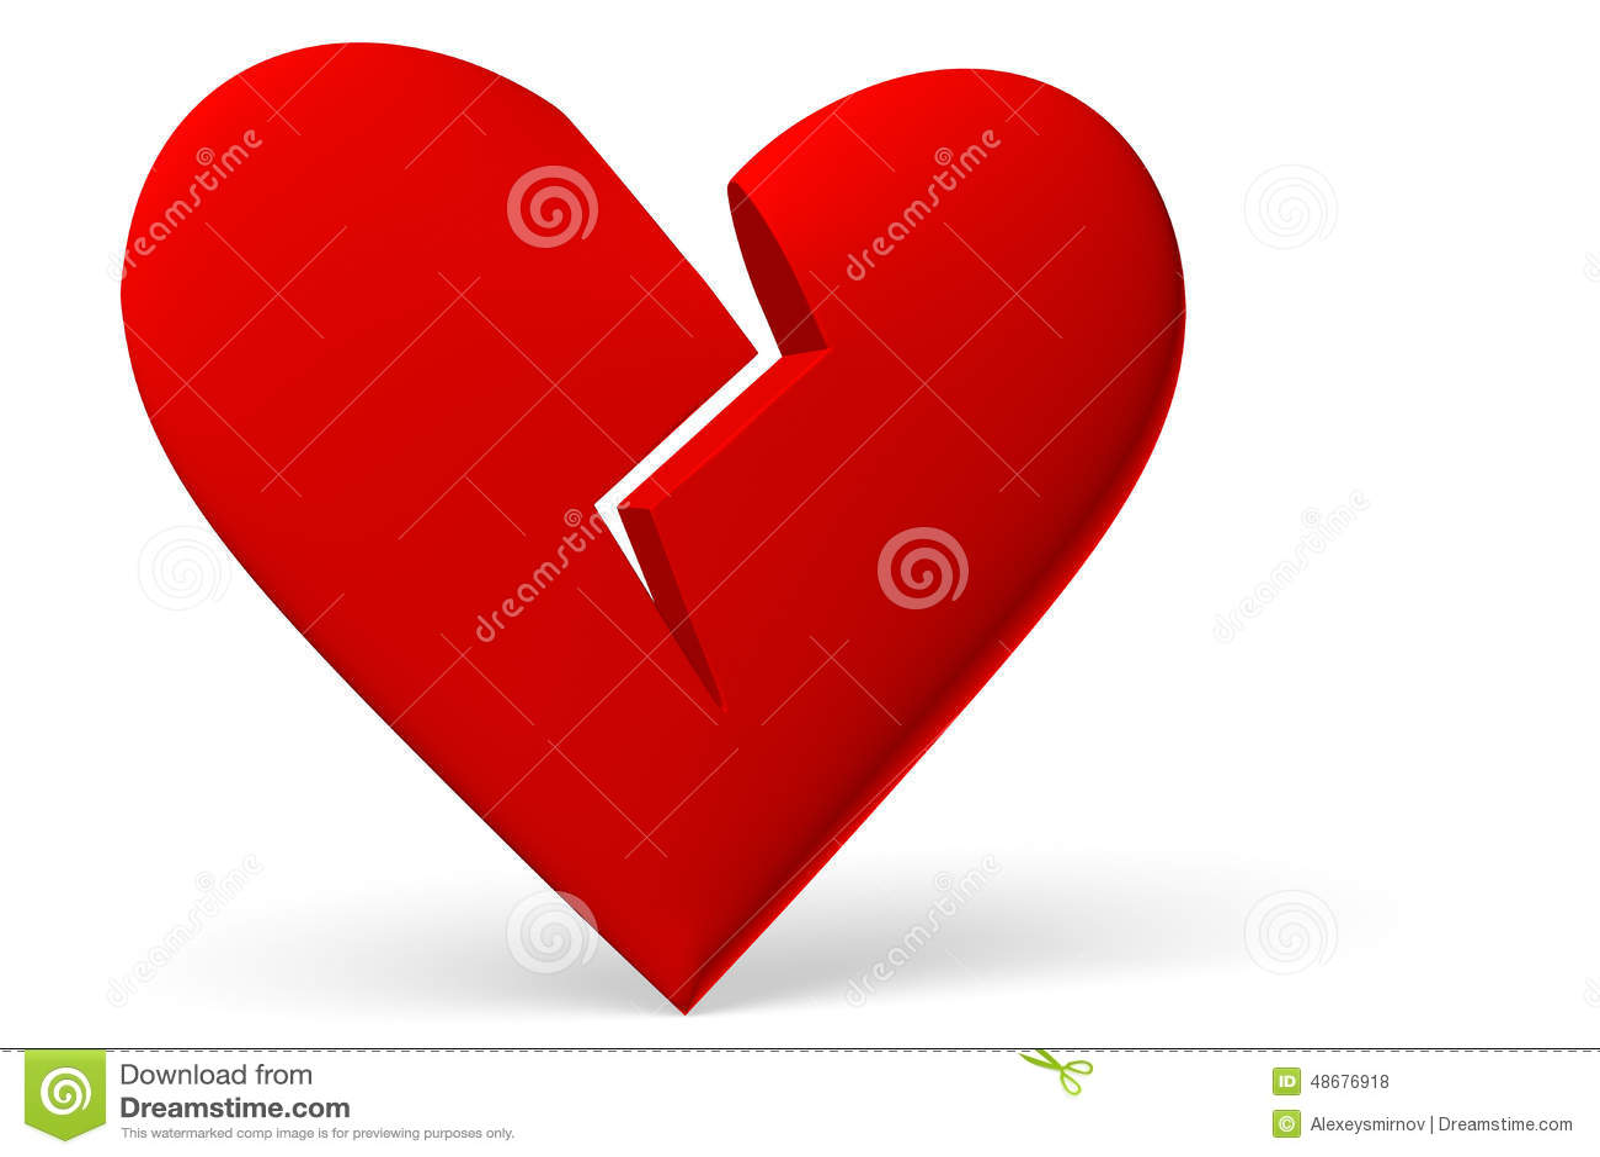 Red Broken Heart Symbol Diagonal View Stock Illustration